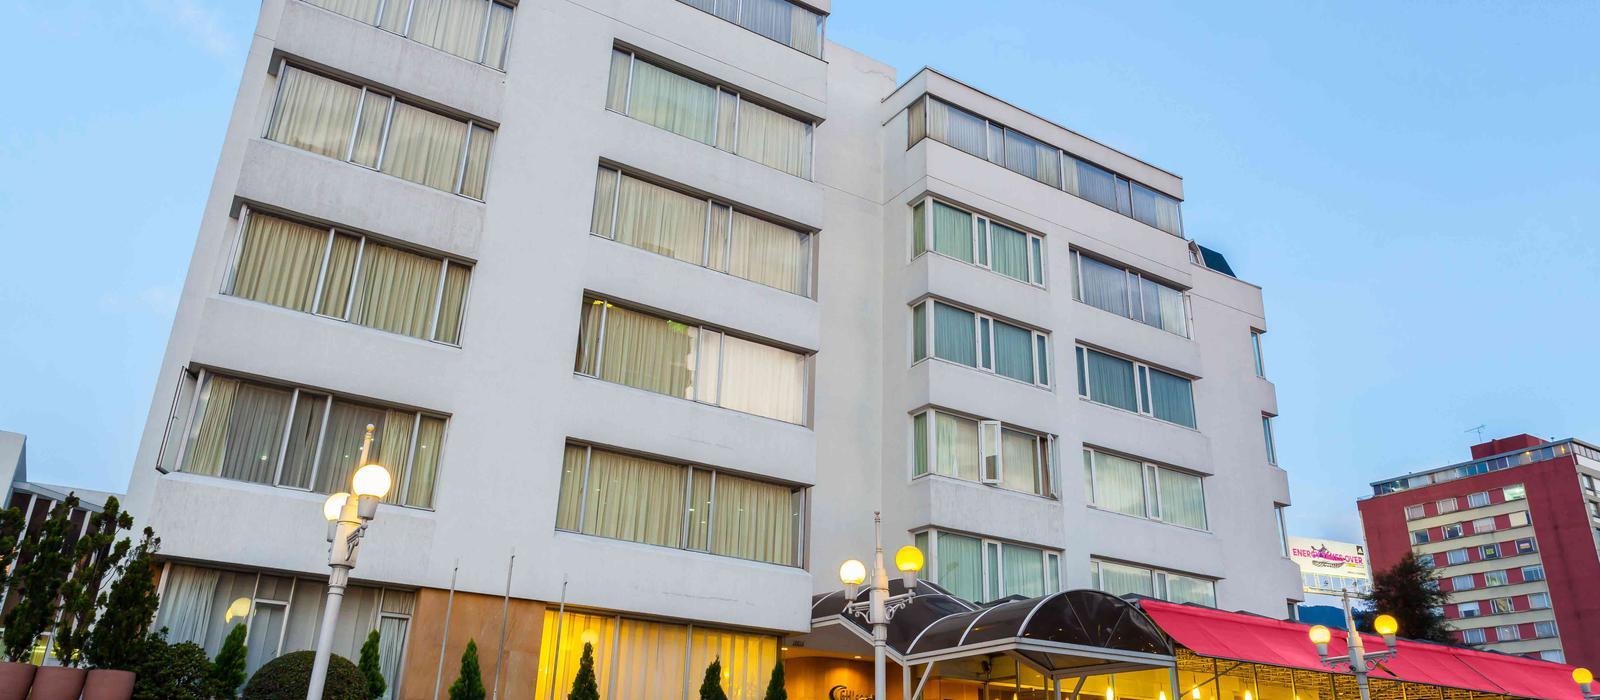 Ghl style hotel belvedere bogot for Hotel luxury 100 bogota